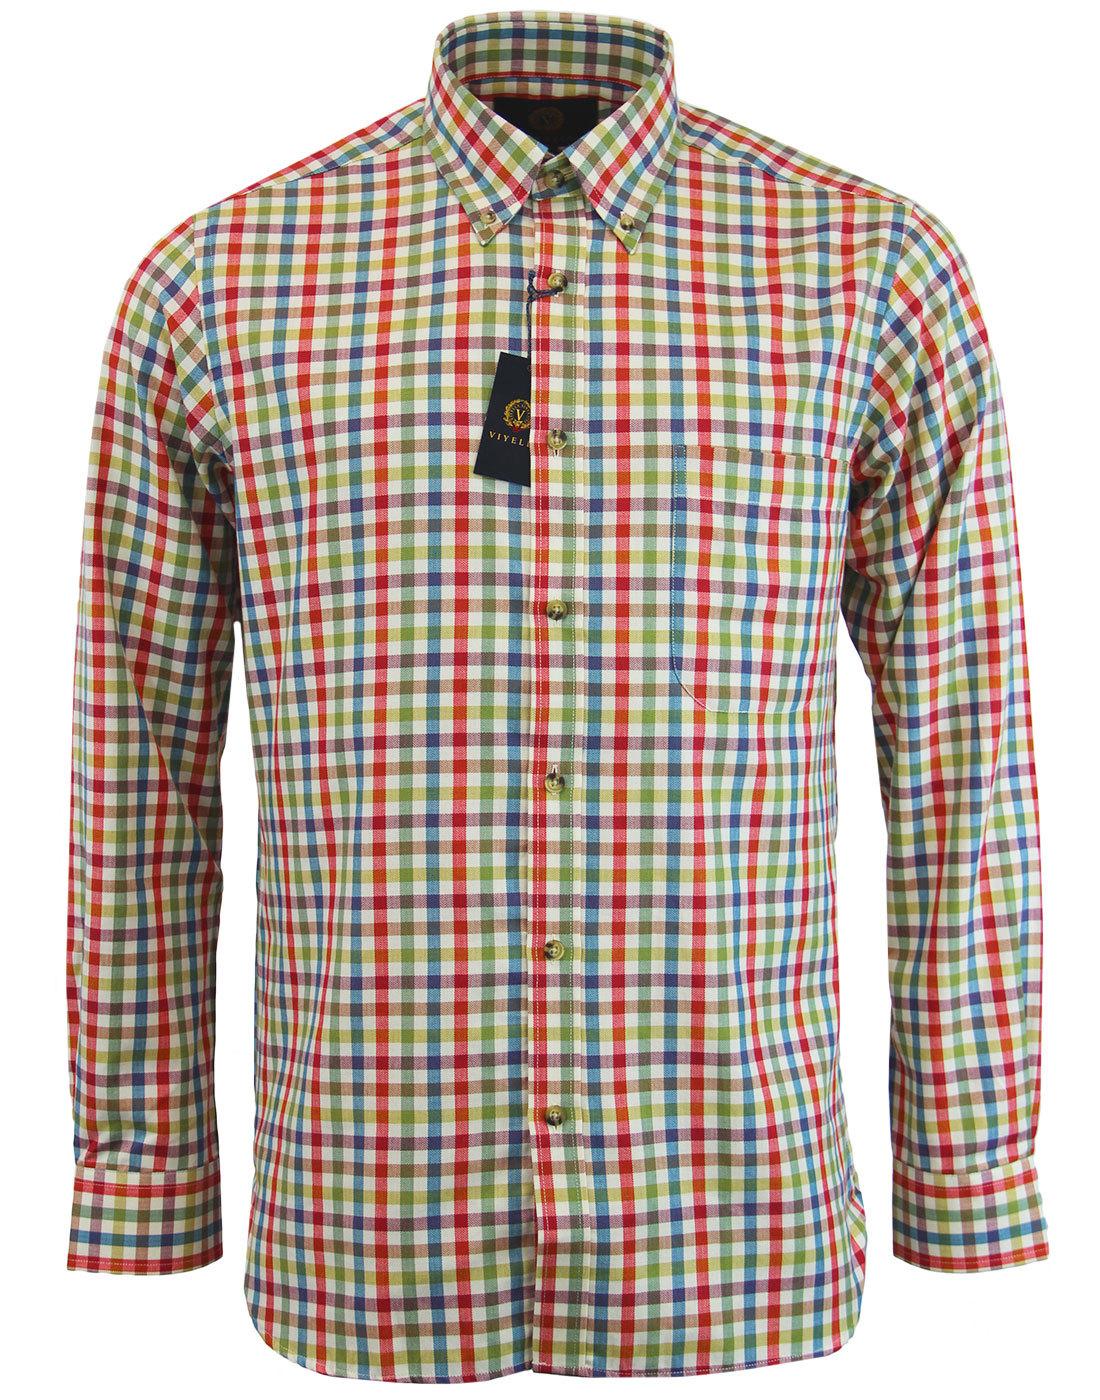 VIYELLA Retro Herringbone Check Button Down Shirt